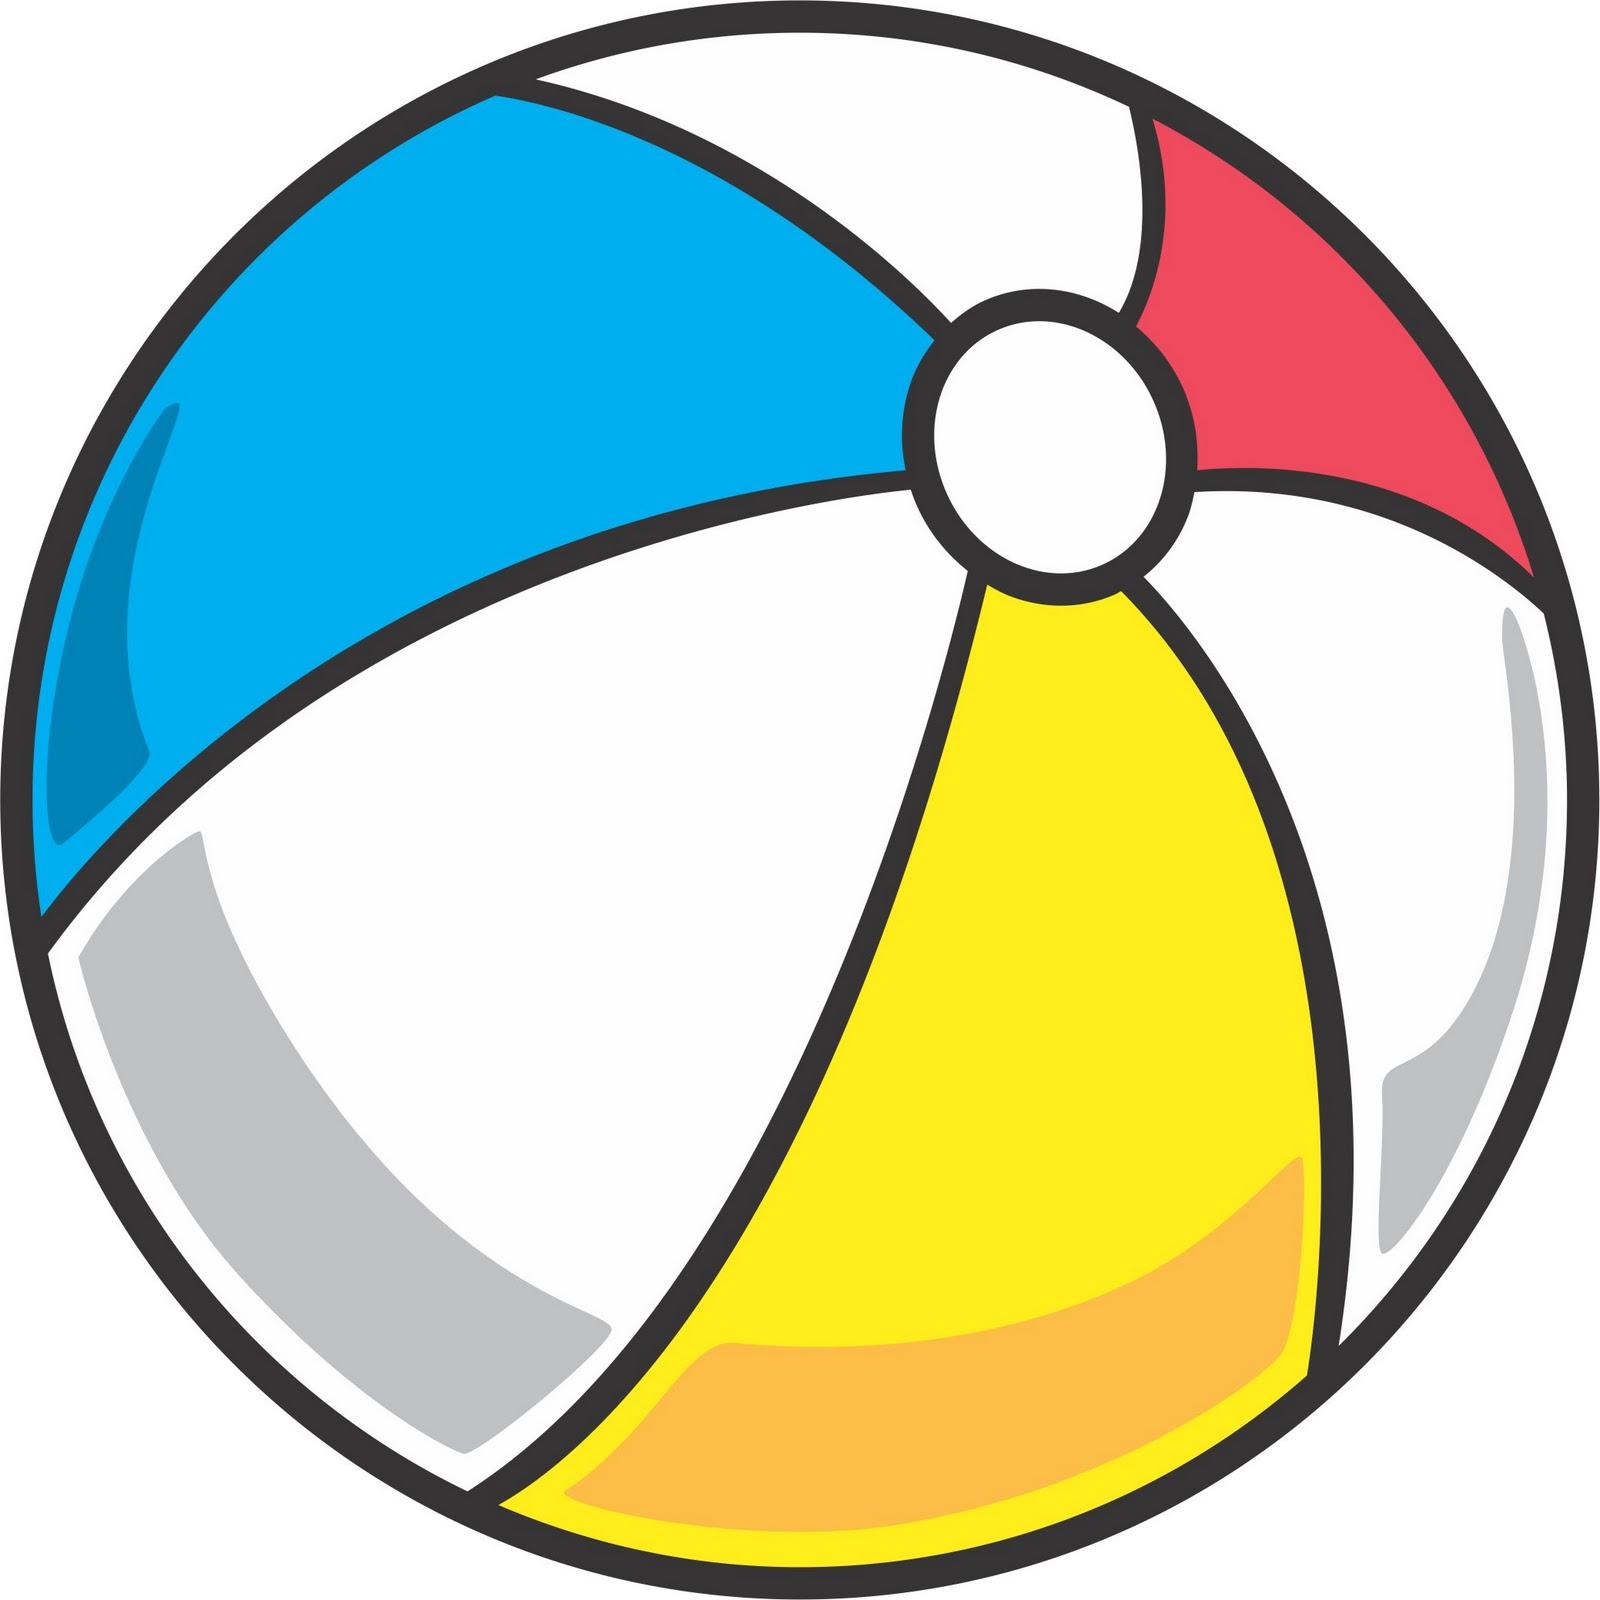 beach ball image - HD1600×1600